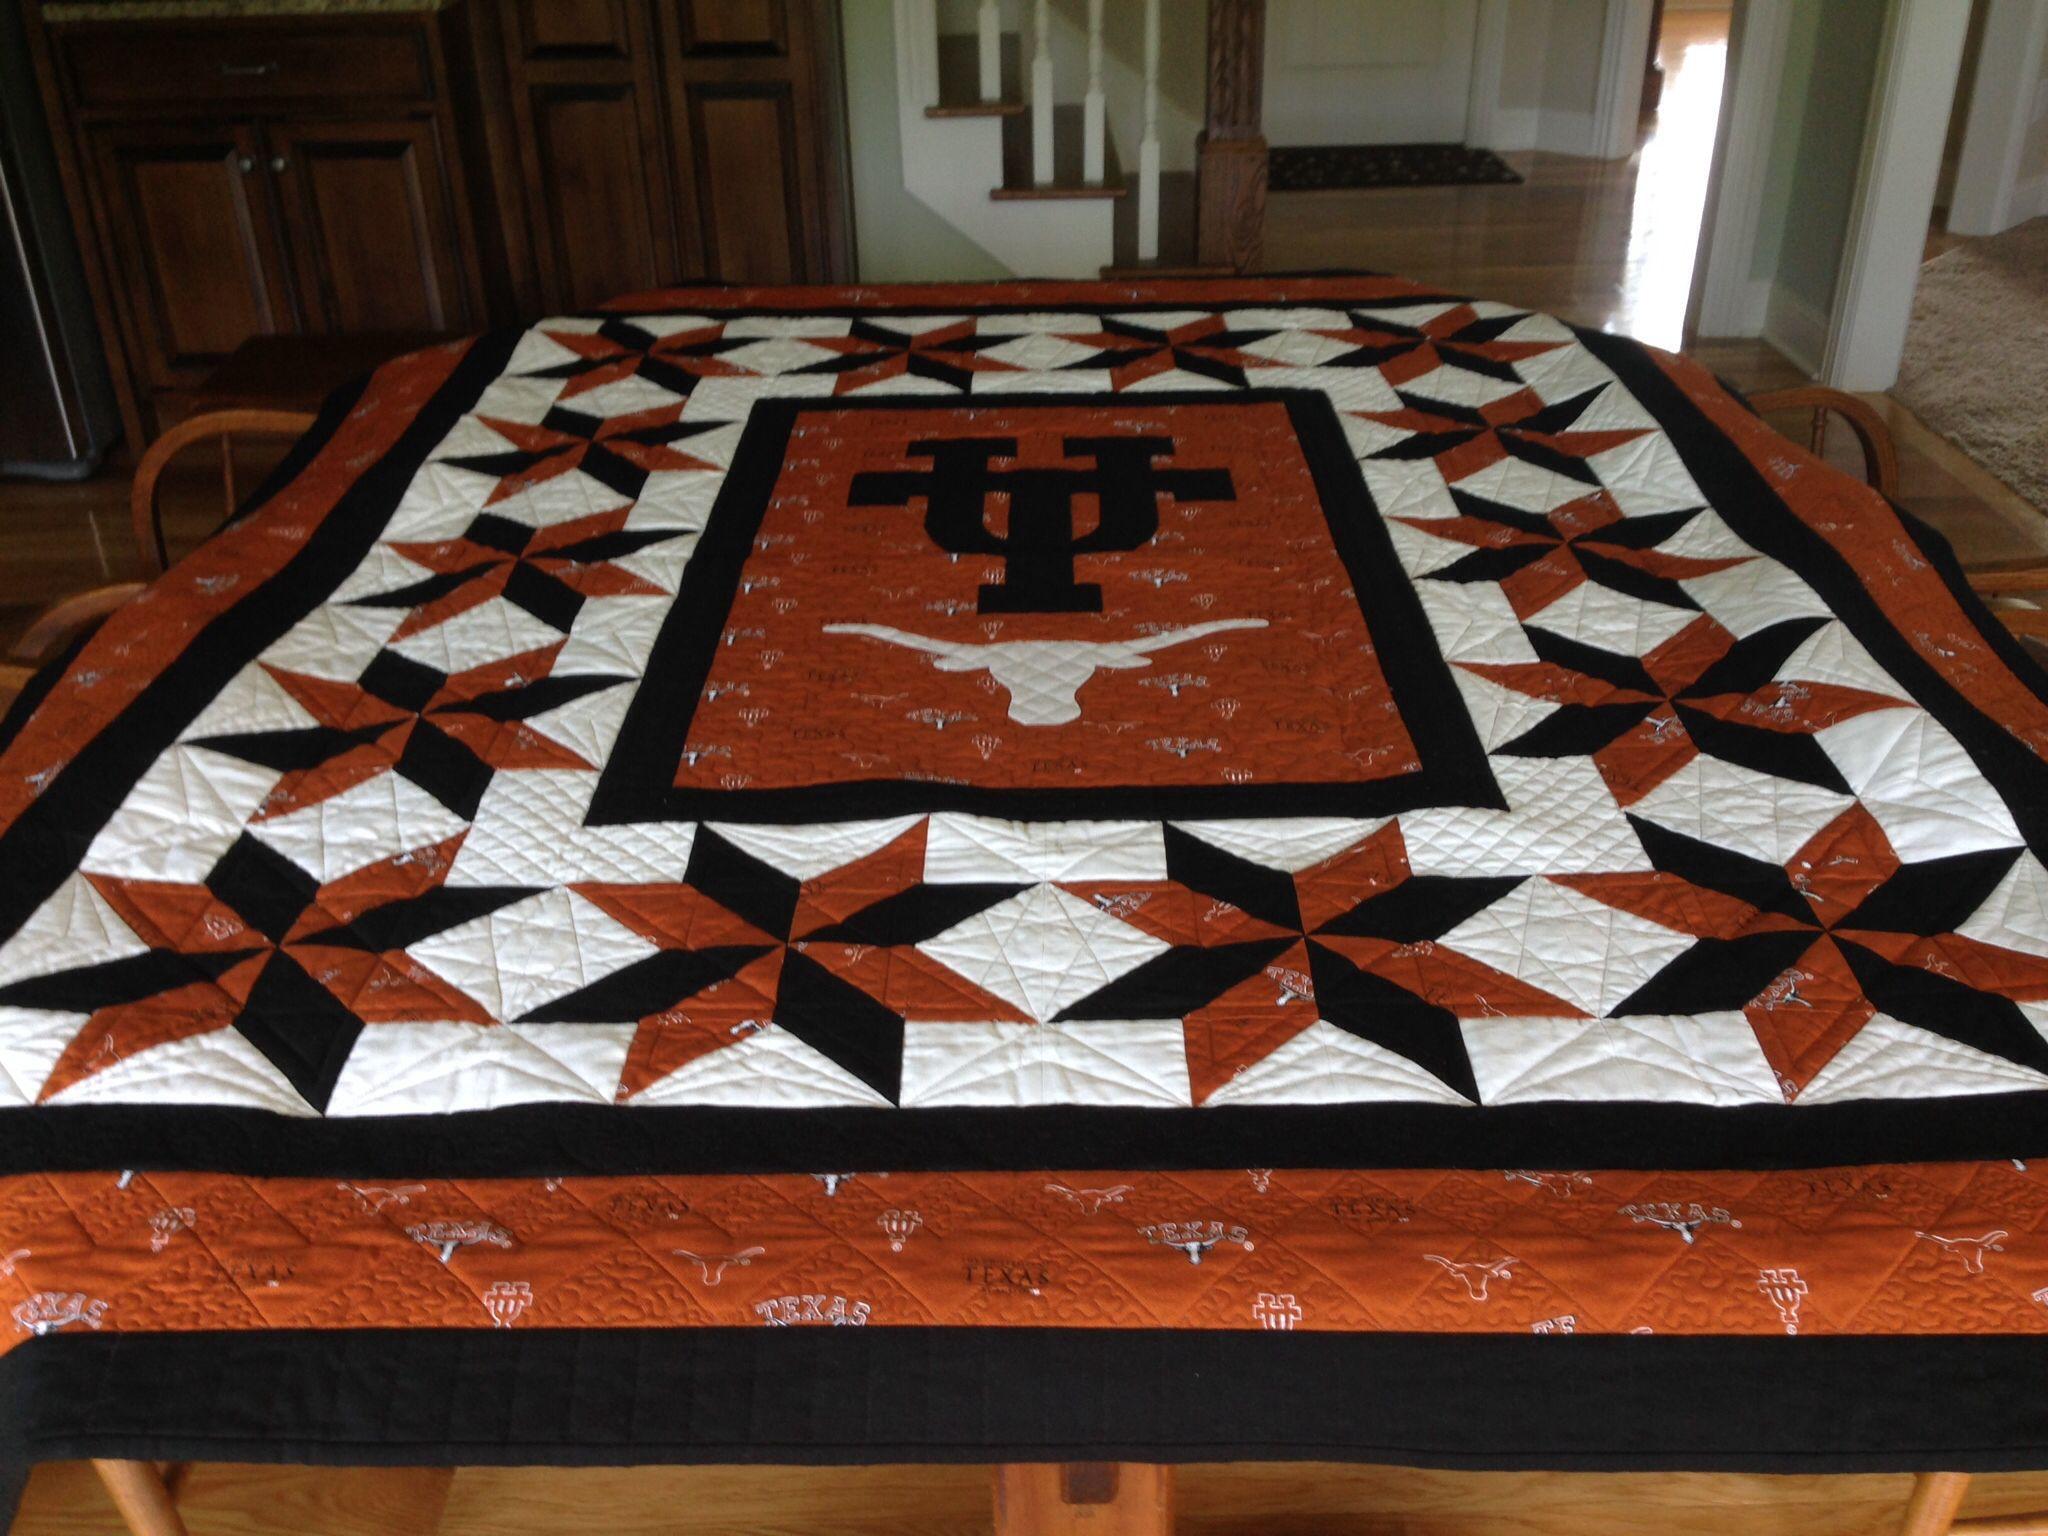 University Of Texas Quilt Beautiful Wish I Had Thought Of That Texas Quilt Football Quilt Texas University Longhorns